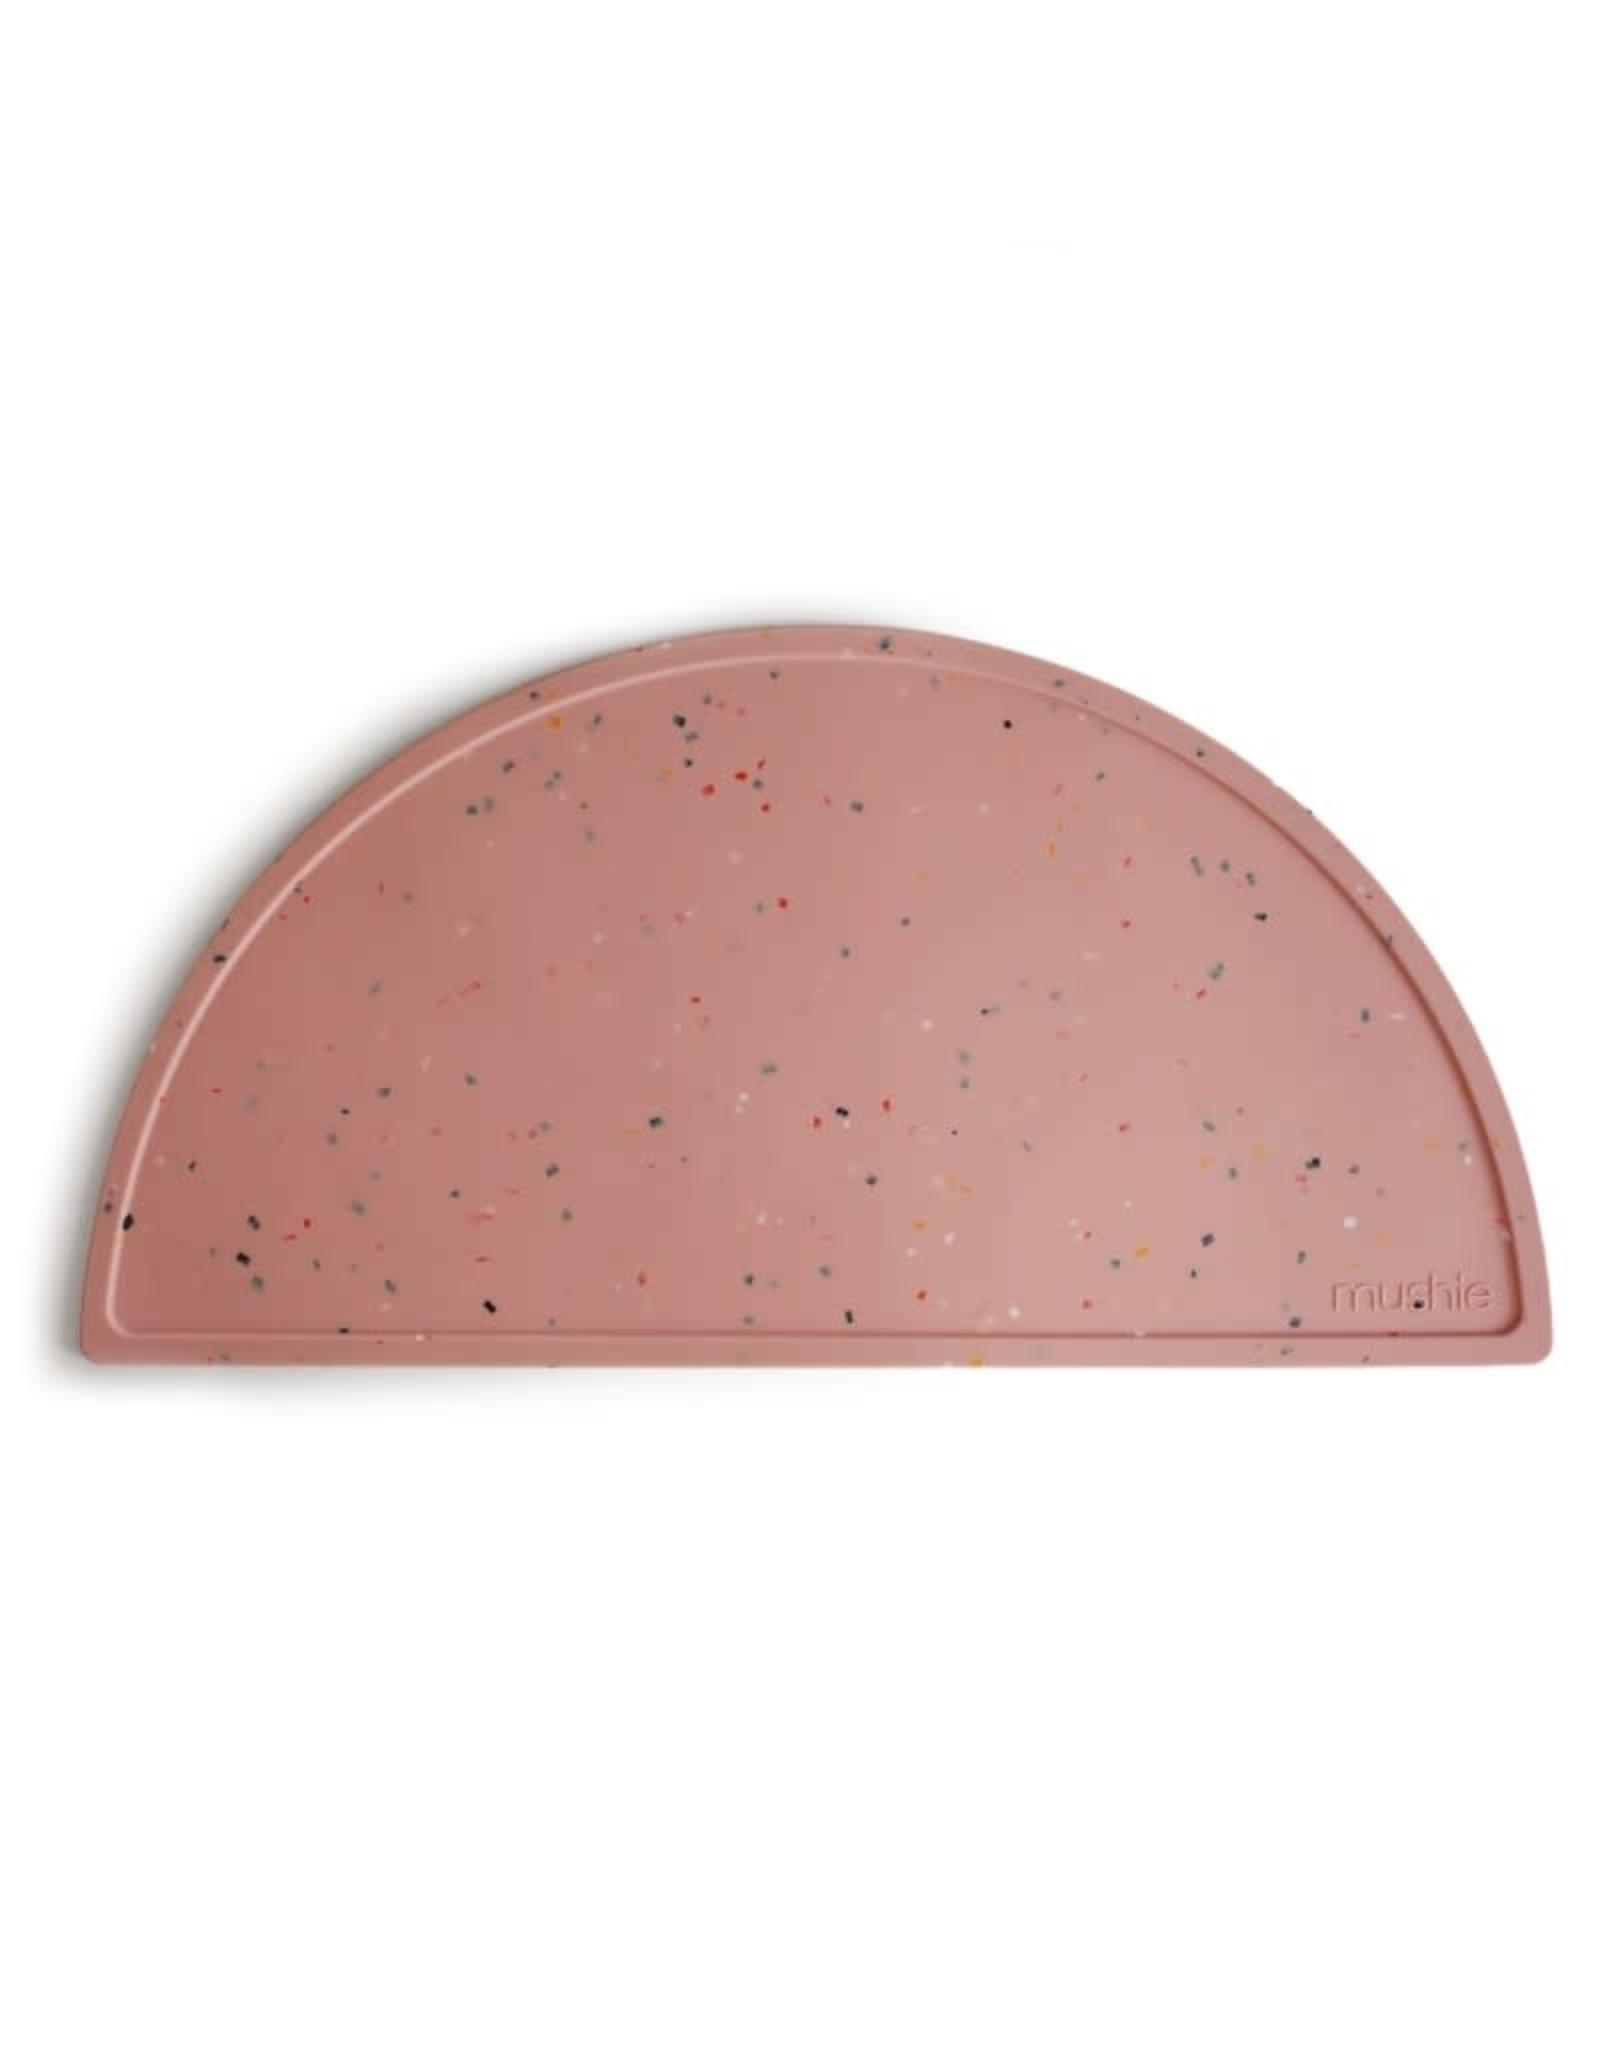 BIBS / mushie Set de table en silicone -  Confetti pink powder